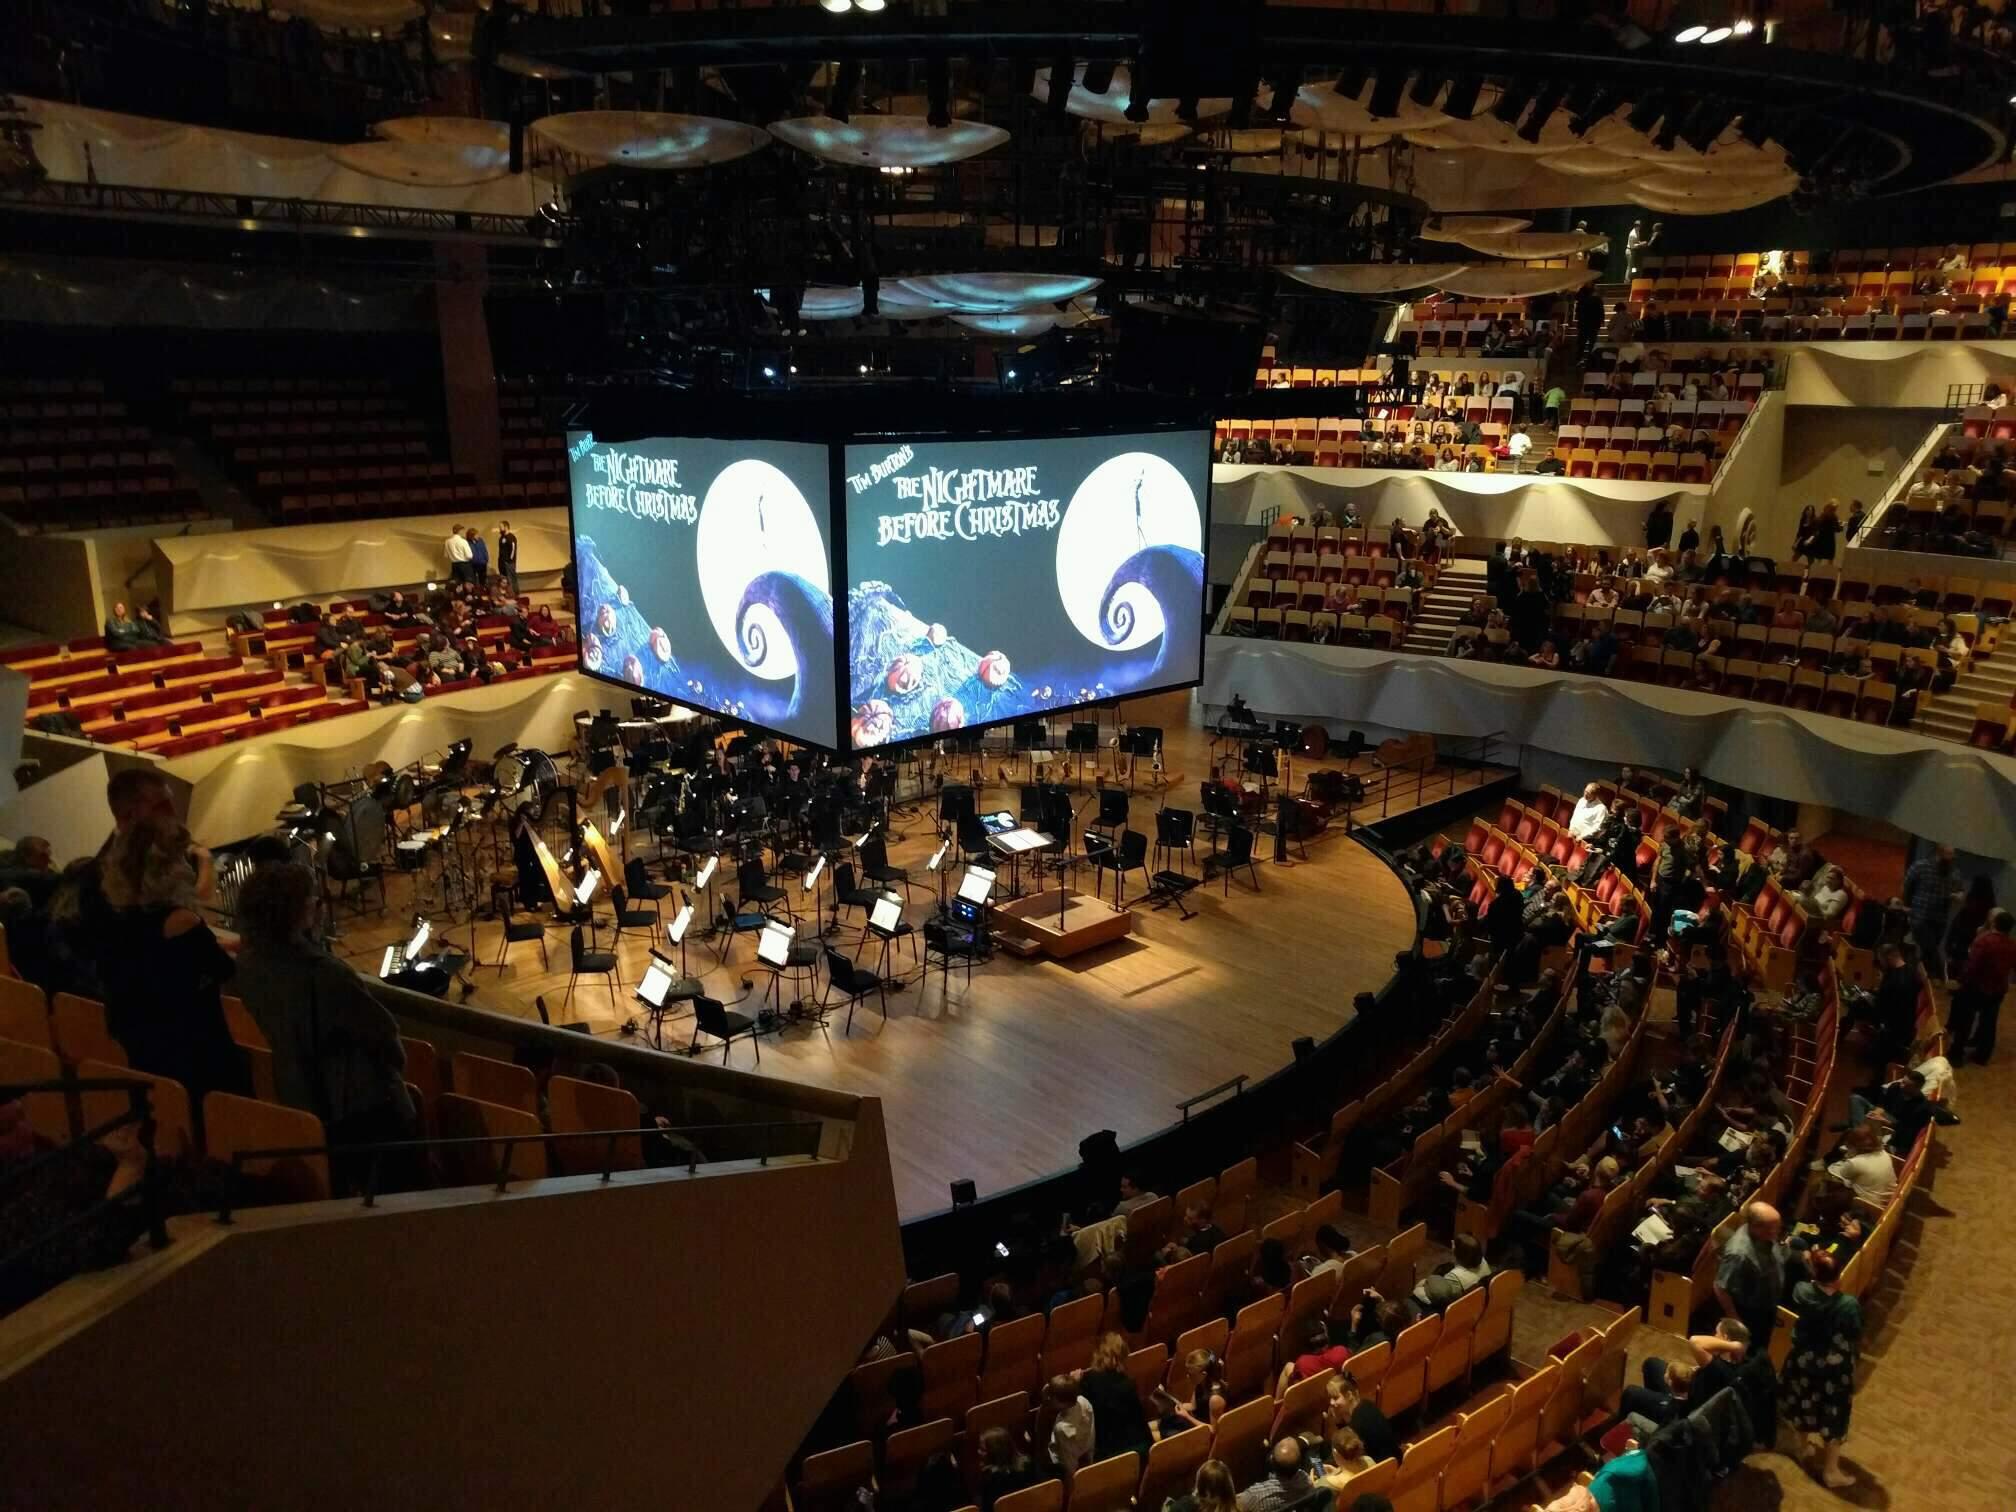 Boettcher Concert Hall Section Mezzanine 6 Row k Seat 63